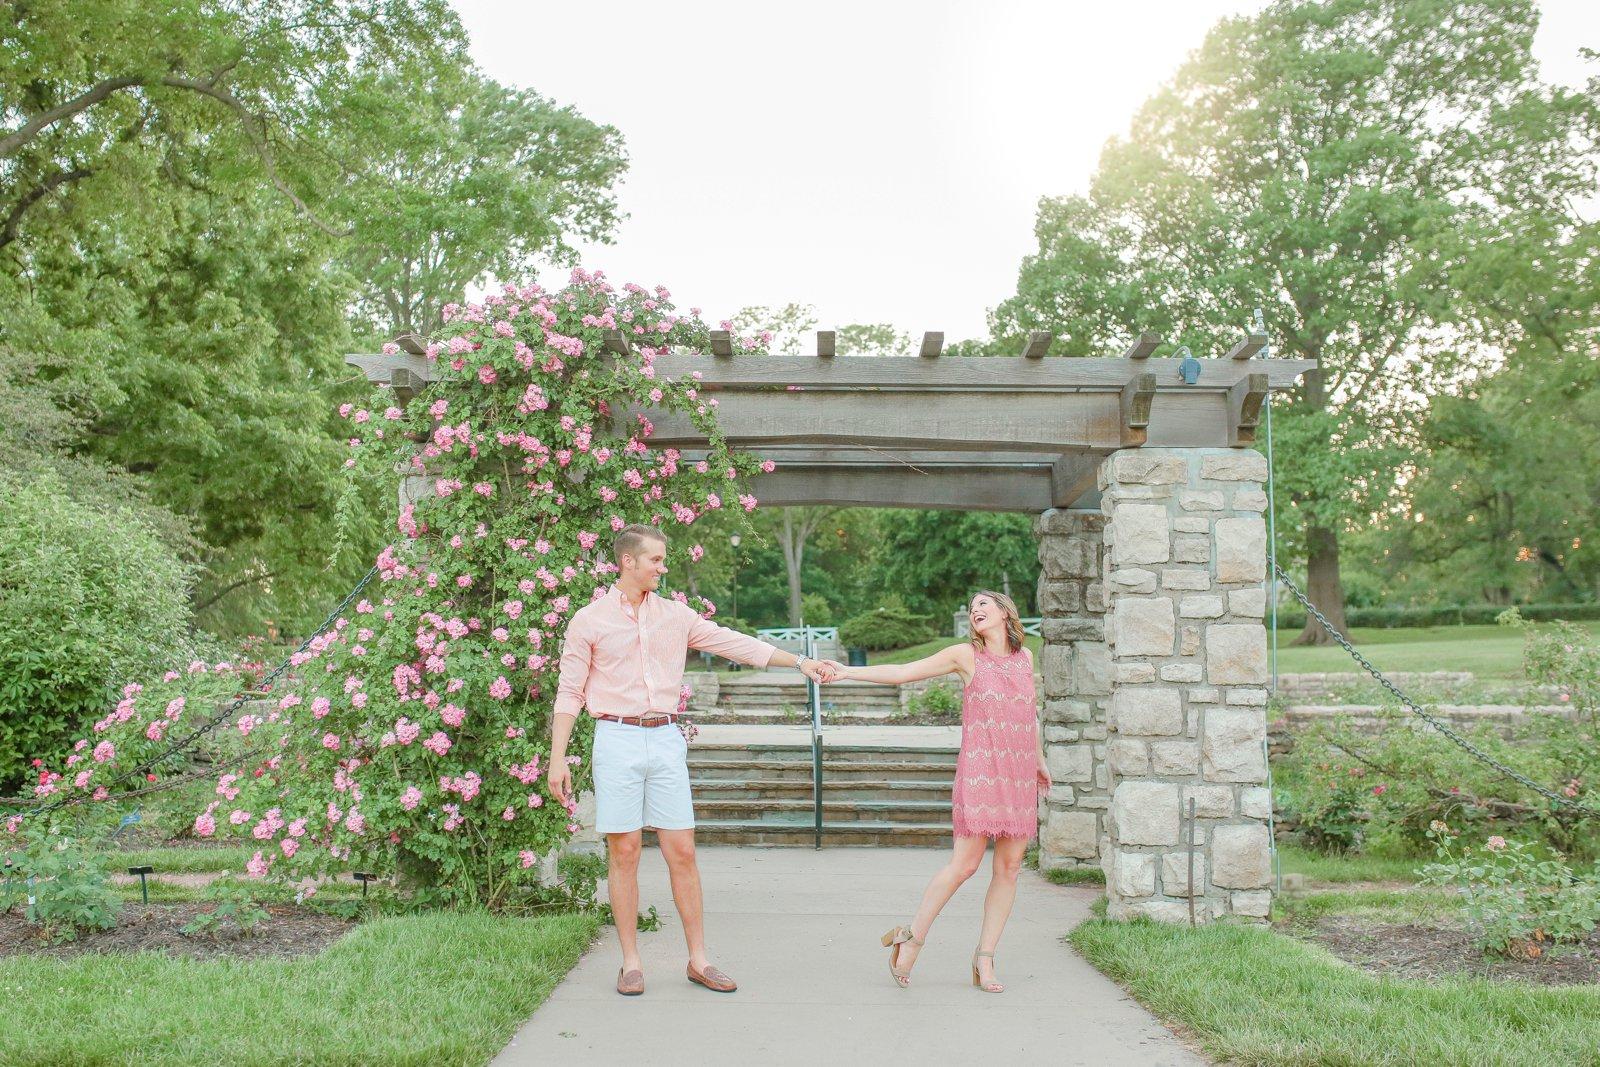 wedding_photographer_Missouri_Destination_elope_intimate_Saint_James_MO_Missouri_KansasCity_Jeff_City_Jefferson_Columbia_Engagement_Photos_Pictures_Session_Best_Videographer_0382.jpg